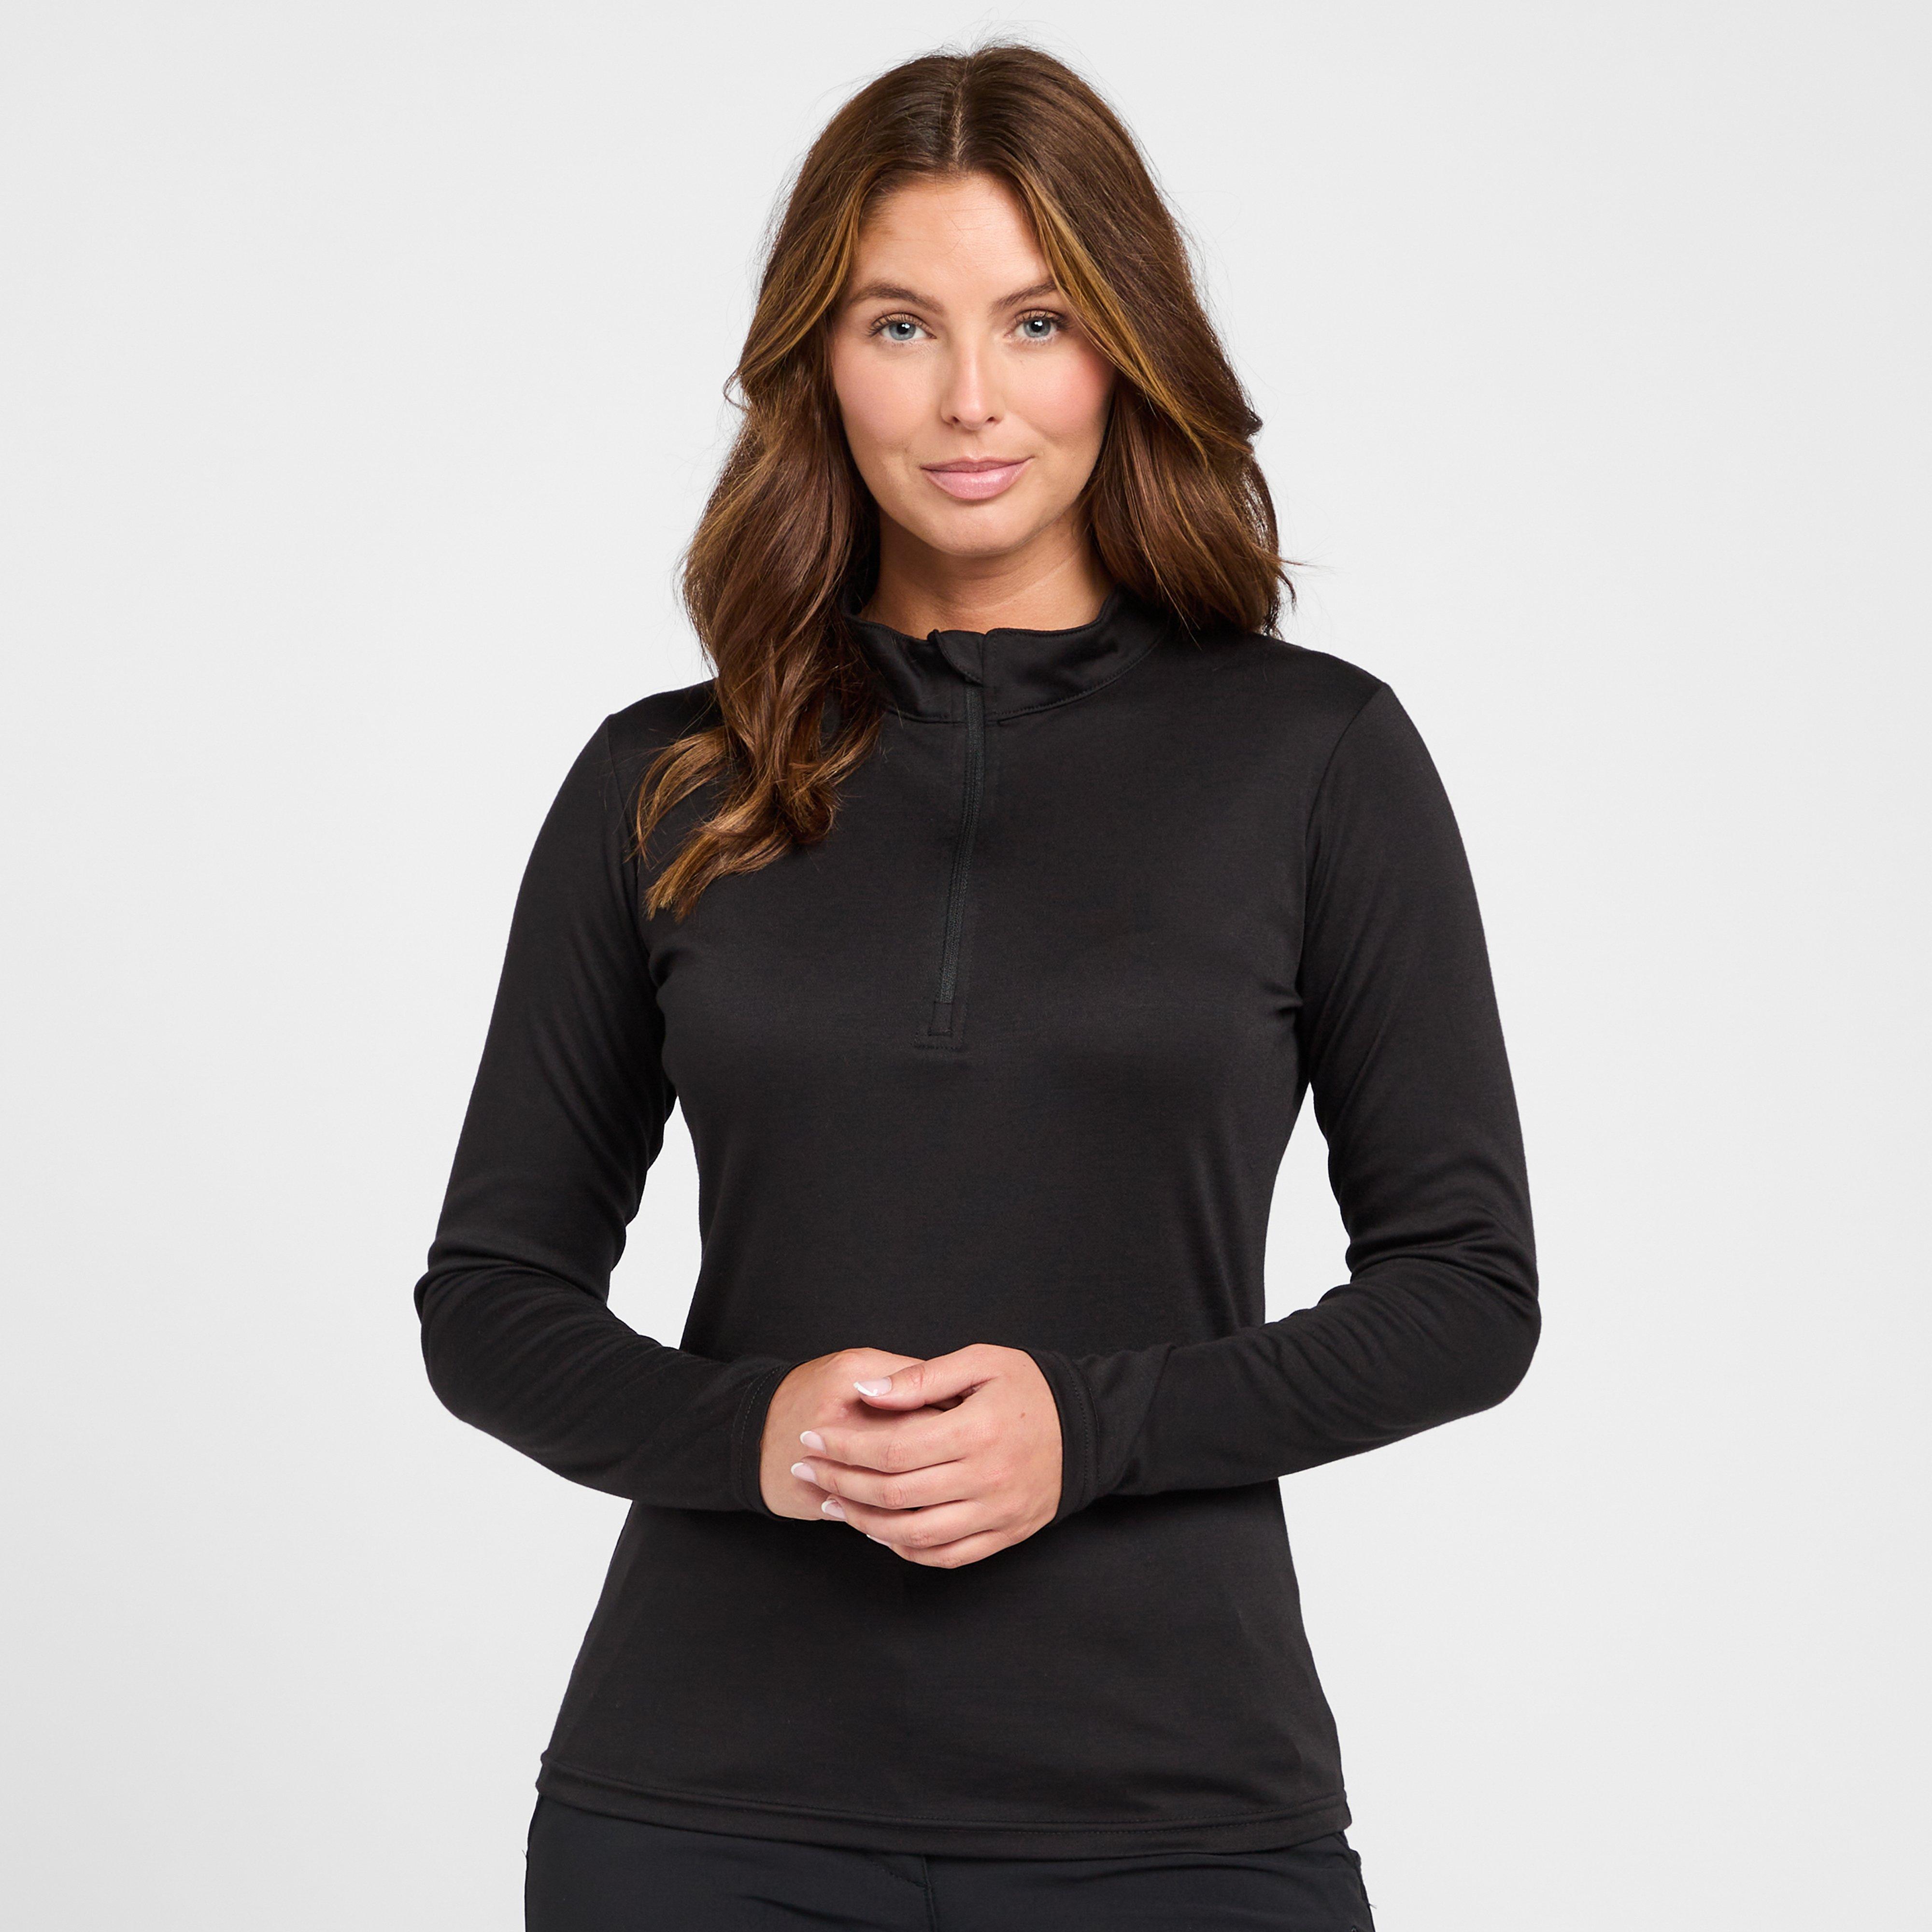 Peter Storm Womens Long Sleeve Thermal Crew Baselayer - Black/blk  Black/blk